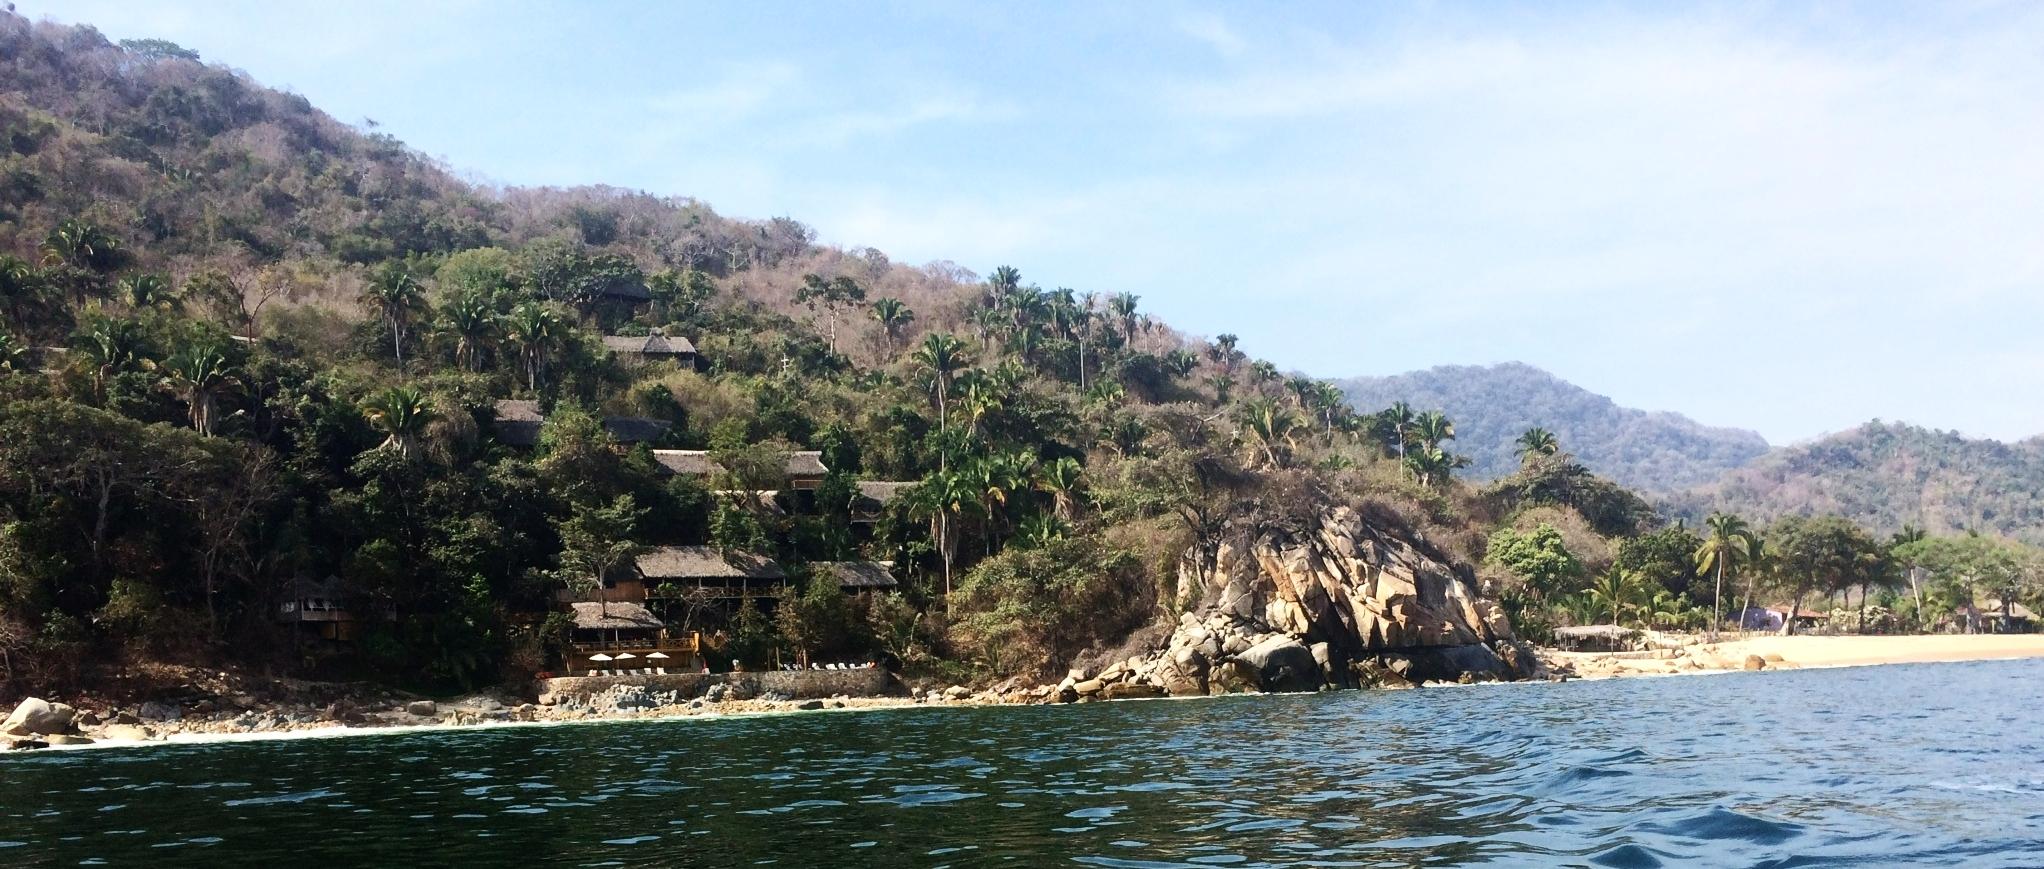 Xinalani from a boat